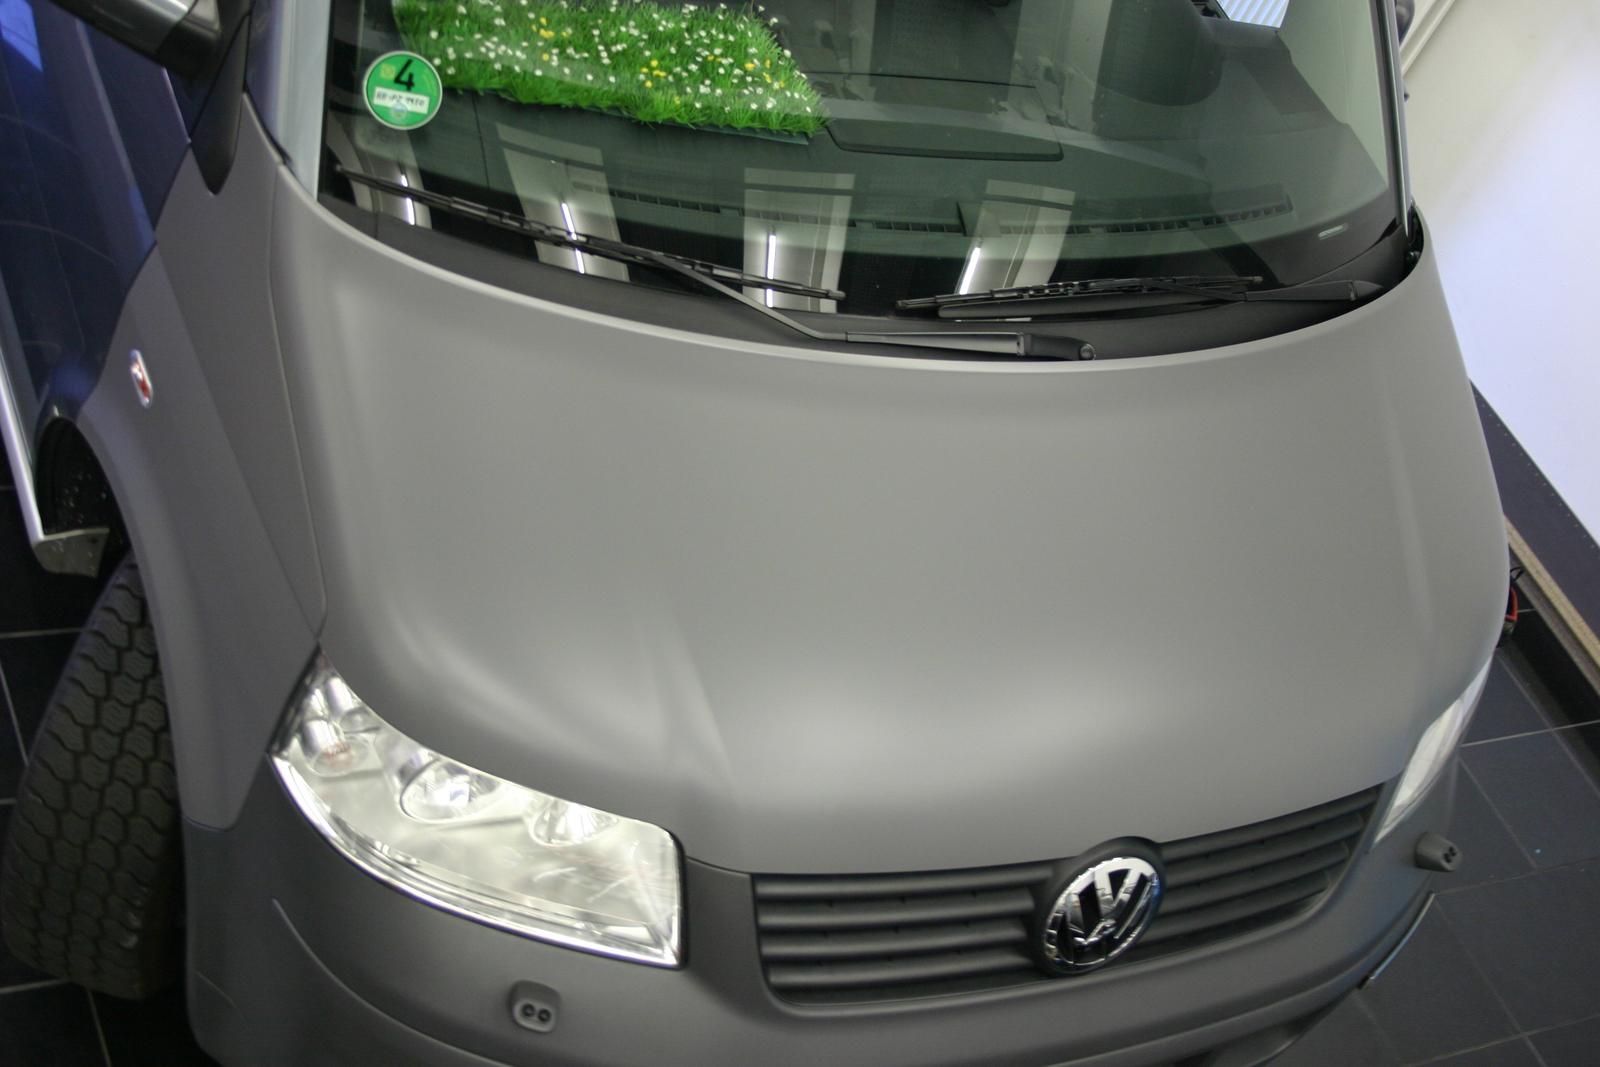 VW_T5_PANAMERICANA_FOLIERUNG_GRAU_MATT_04